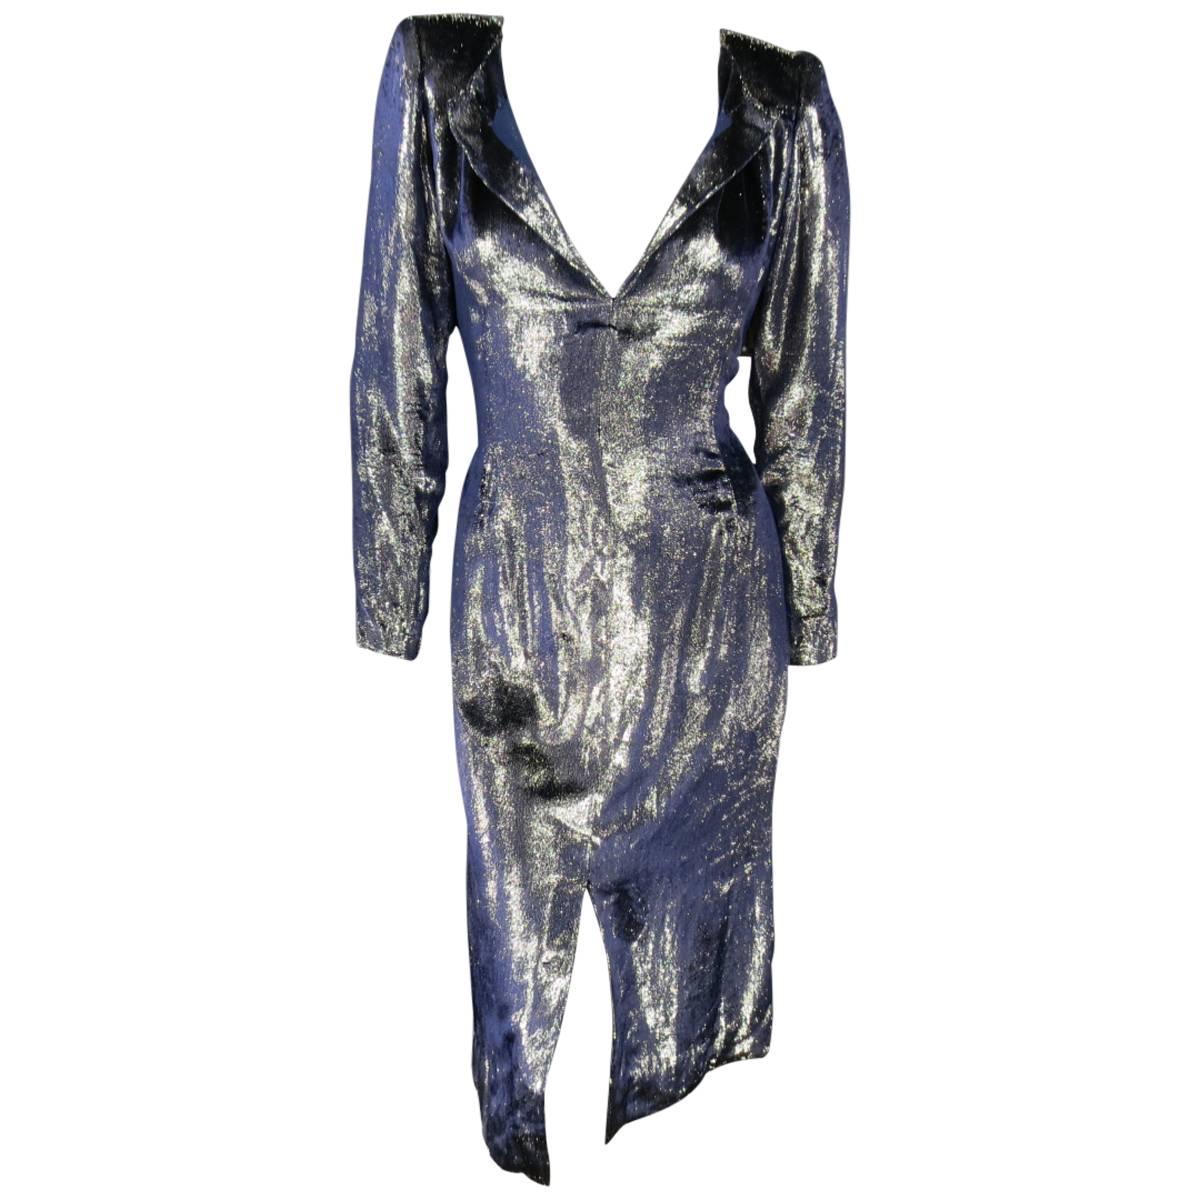 JEAN-LOUIS SCHERRER 2 Silver & Navy Metallic Velvet Long Sleeve Sheath Dress